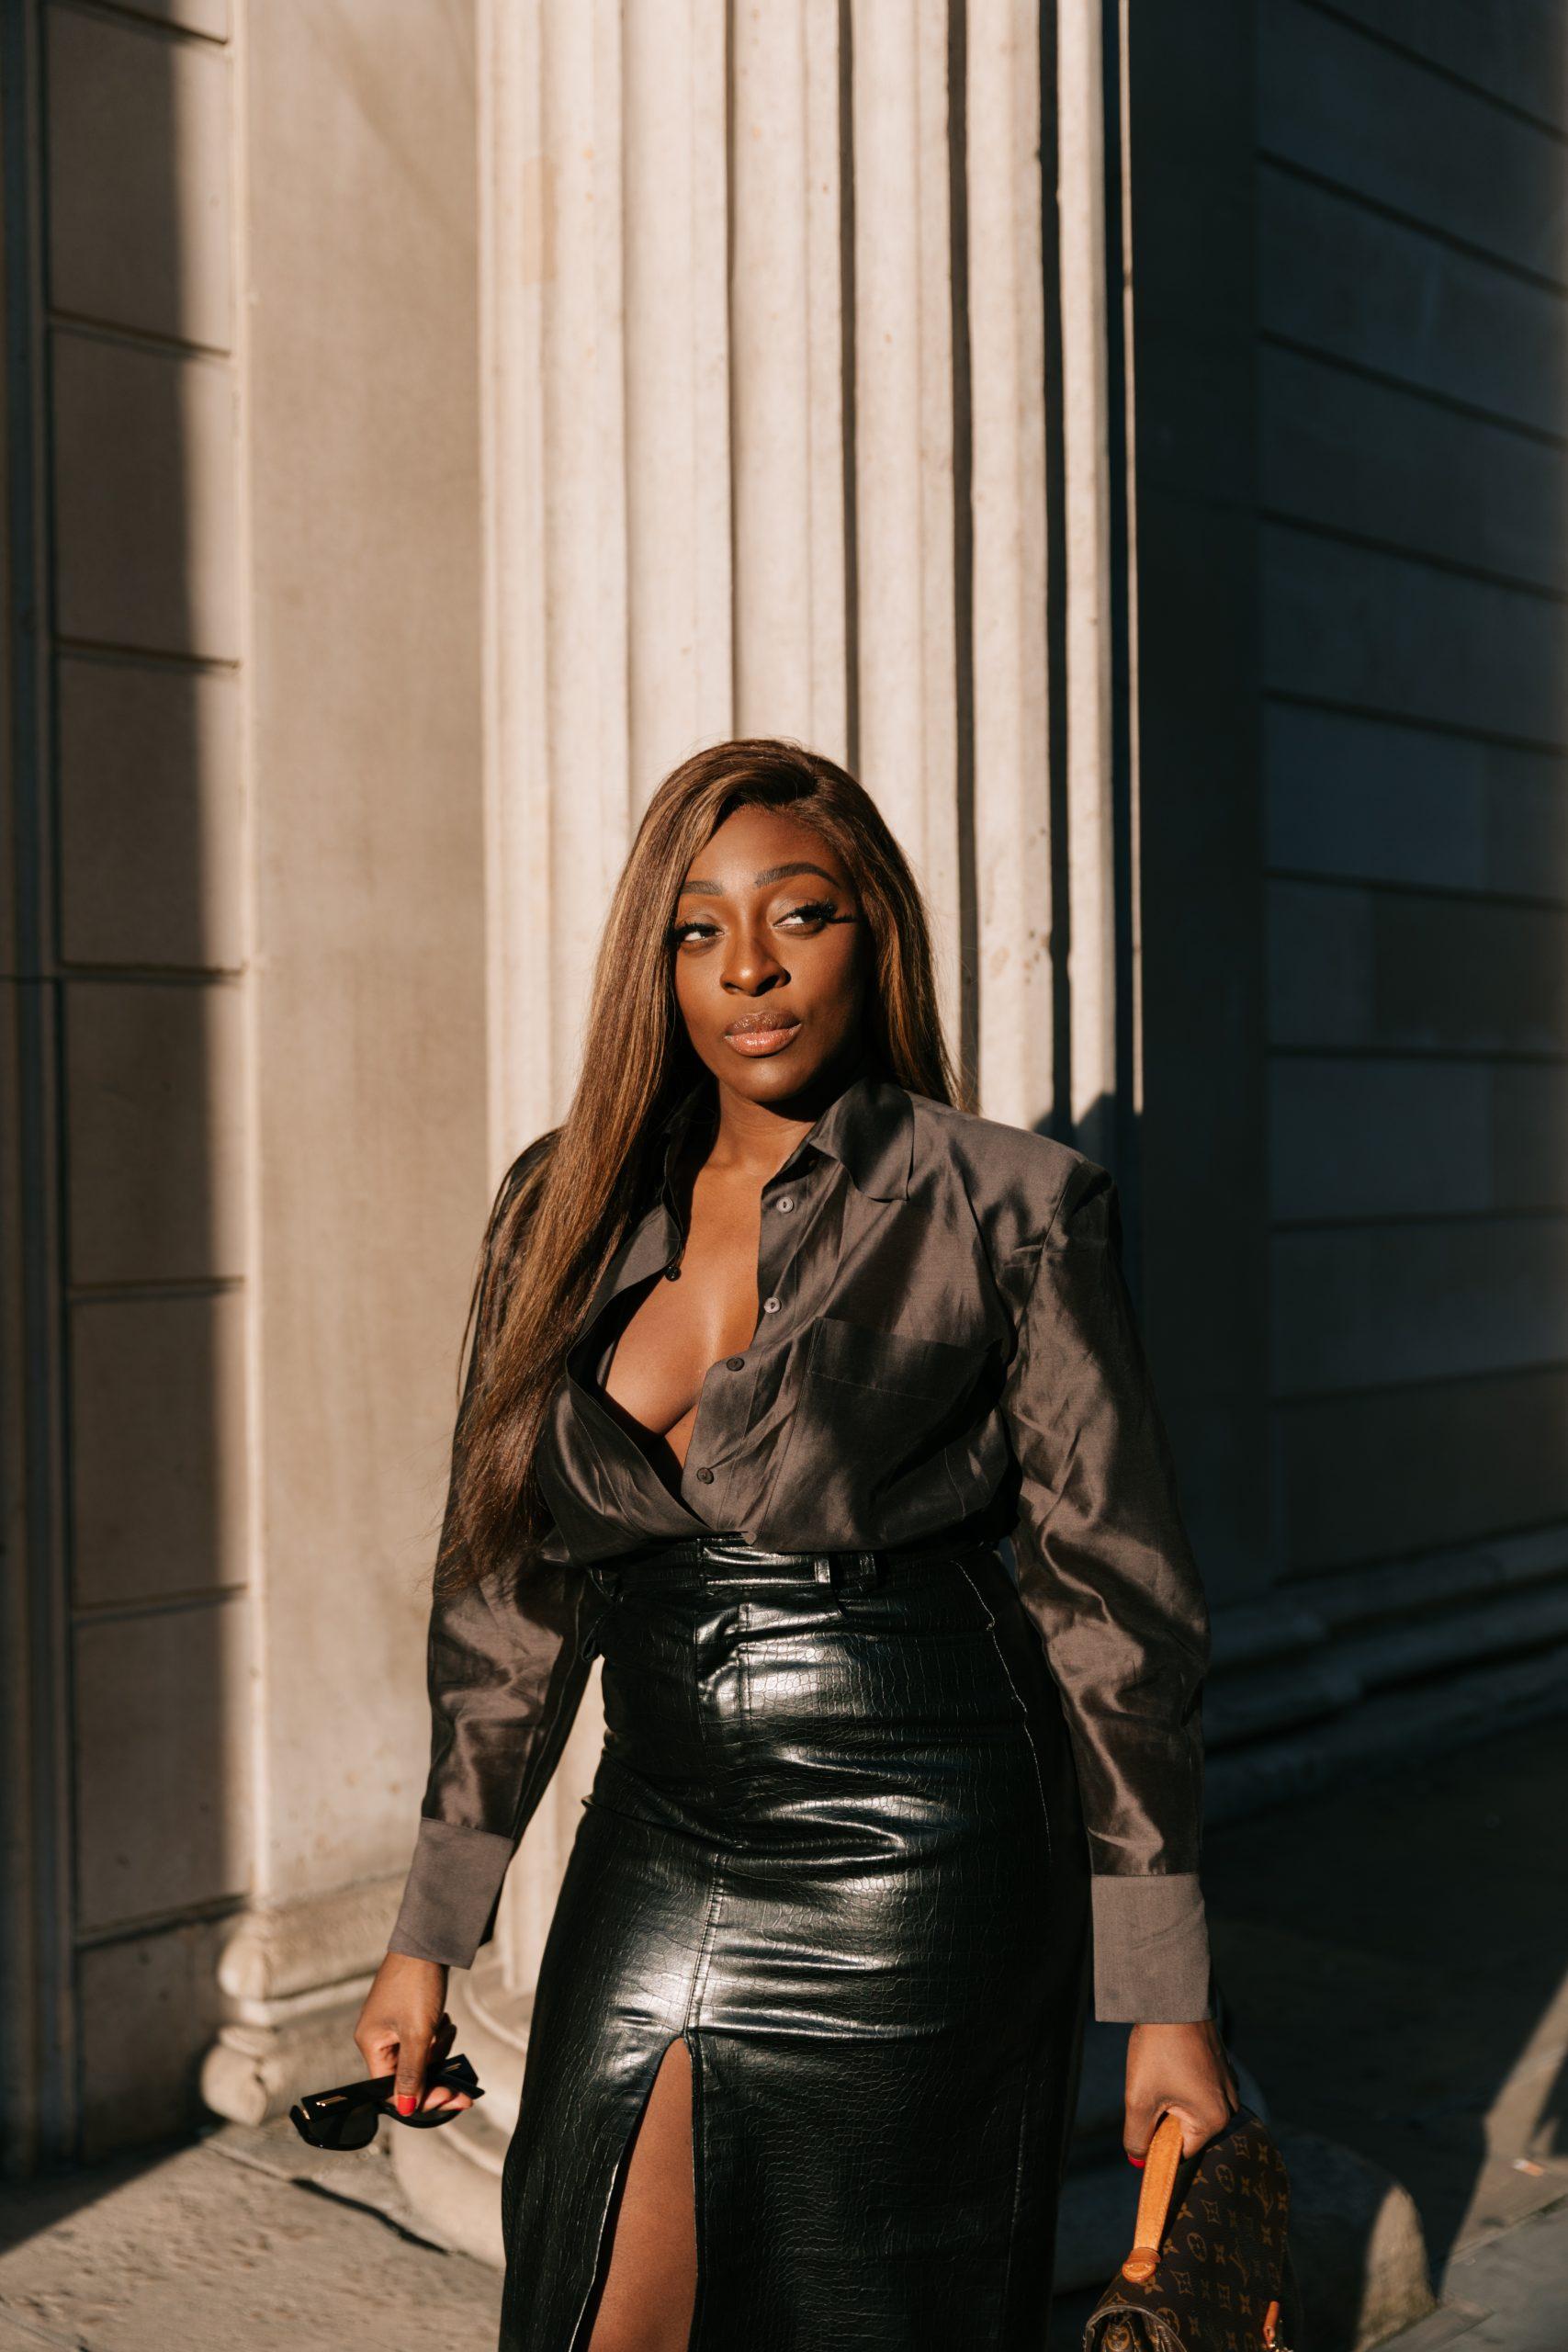 Faux leather skirt zara - chocolate brown silk blouse massimo dutti 6 - close up